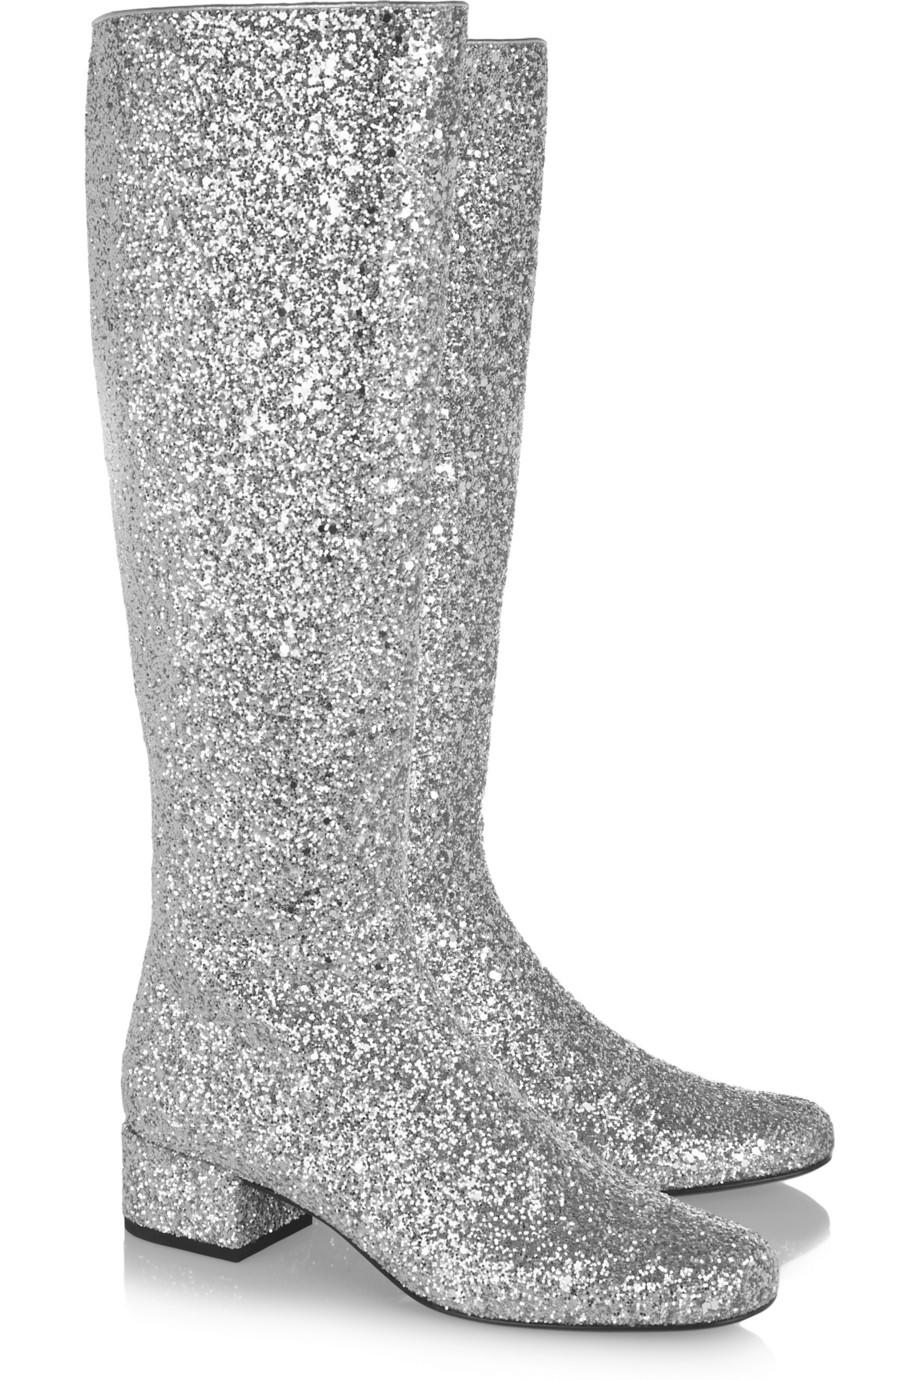 Saint Laurent Glitter Boots